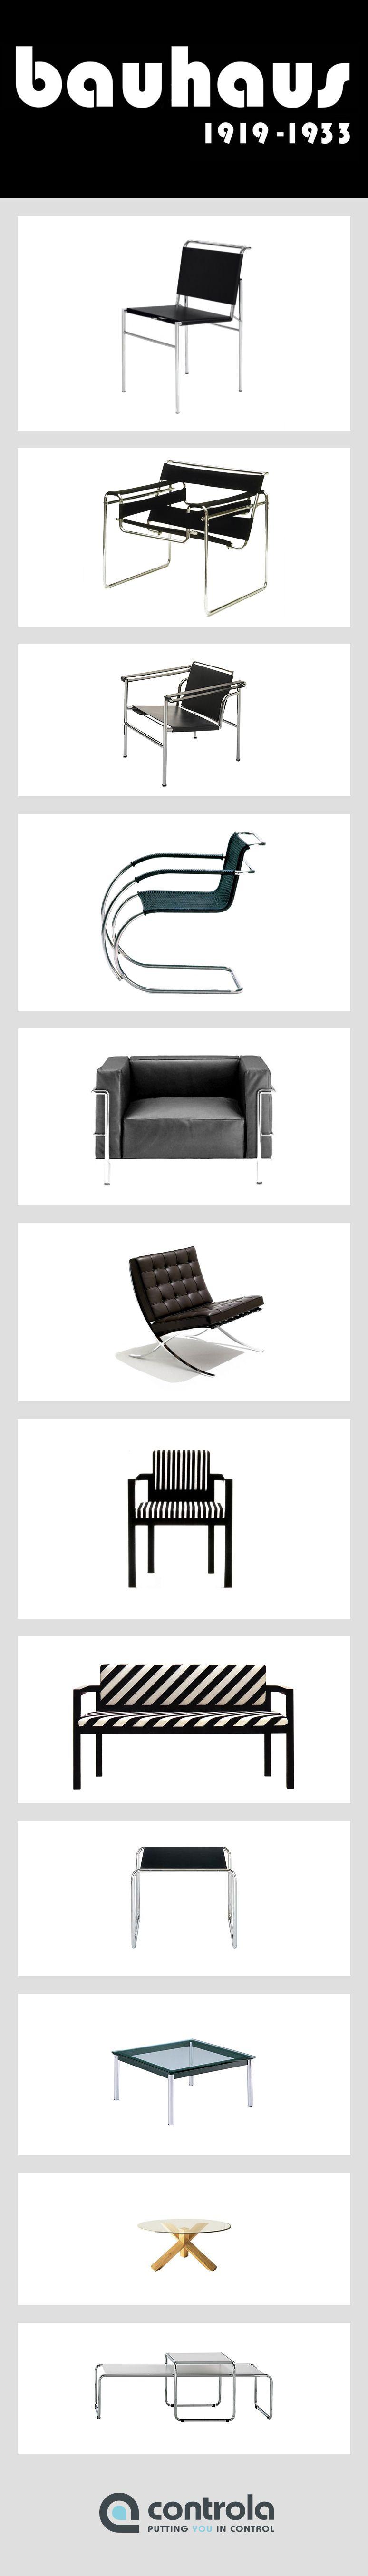 Muebles del movimiento bauhaus dise o perfecto for Muebles zapateros bauhaus